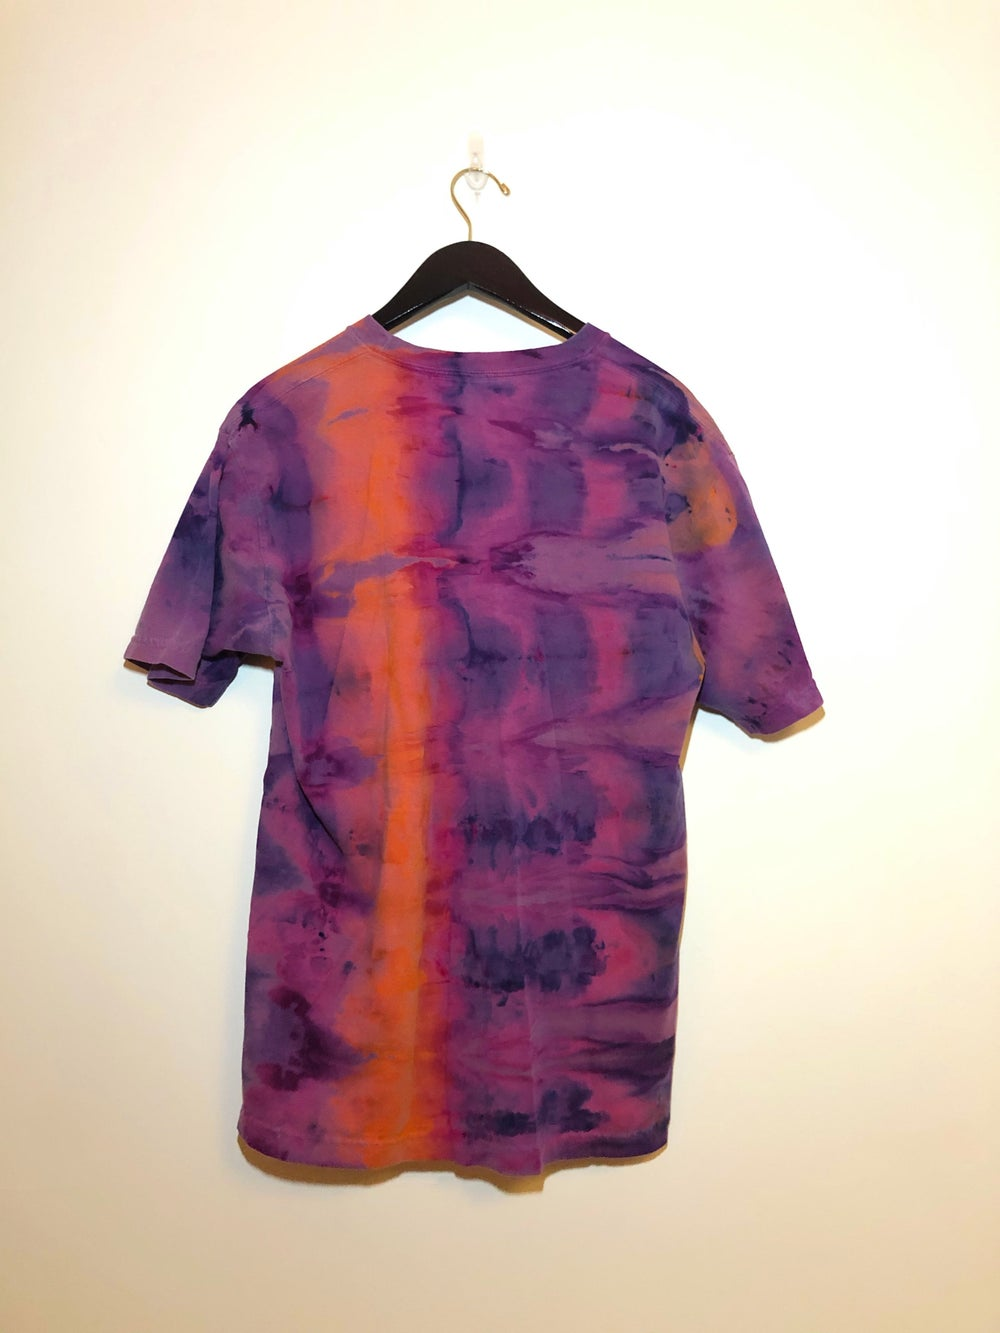 Shirt #10 - Medium